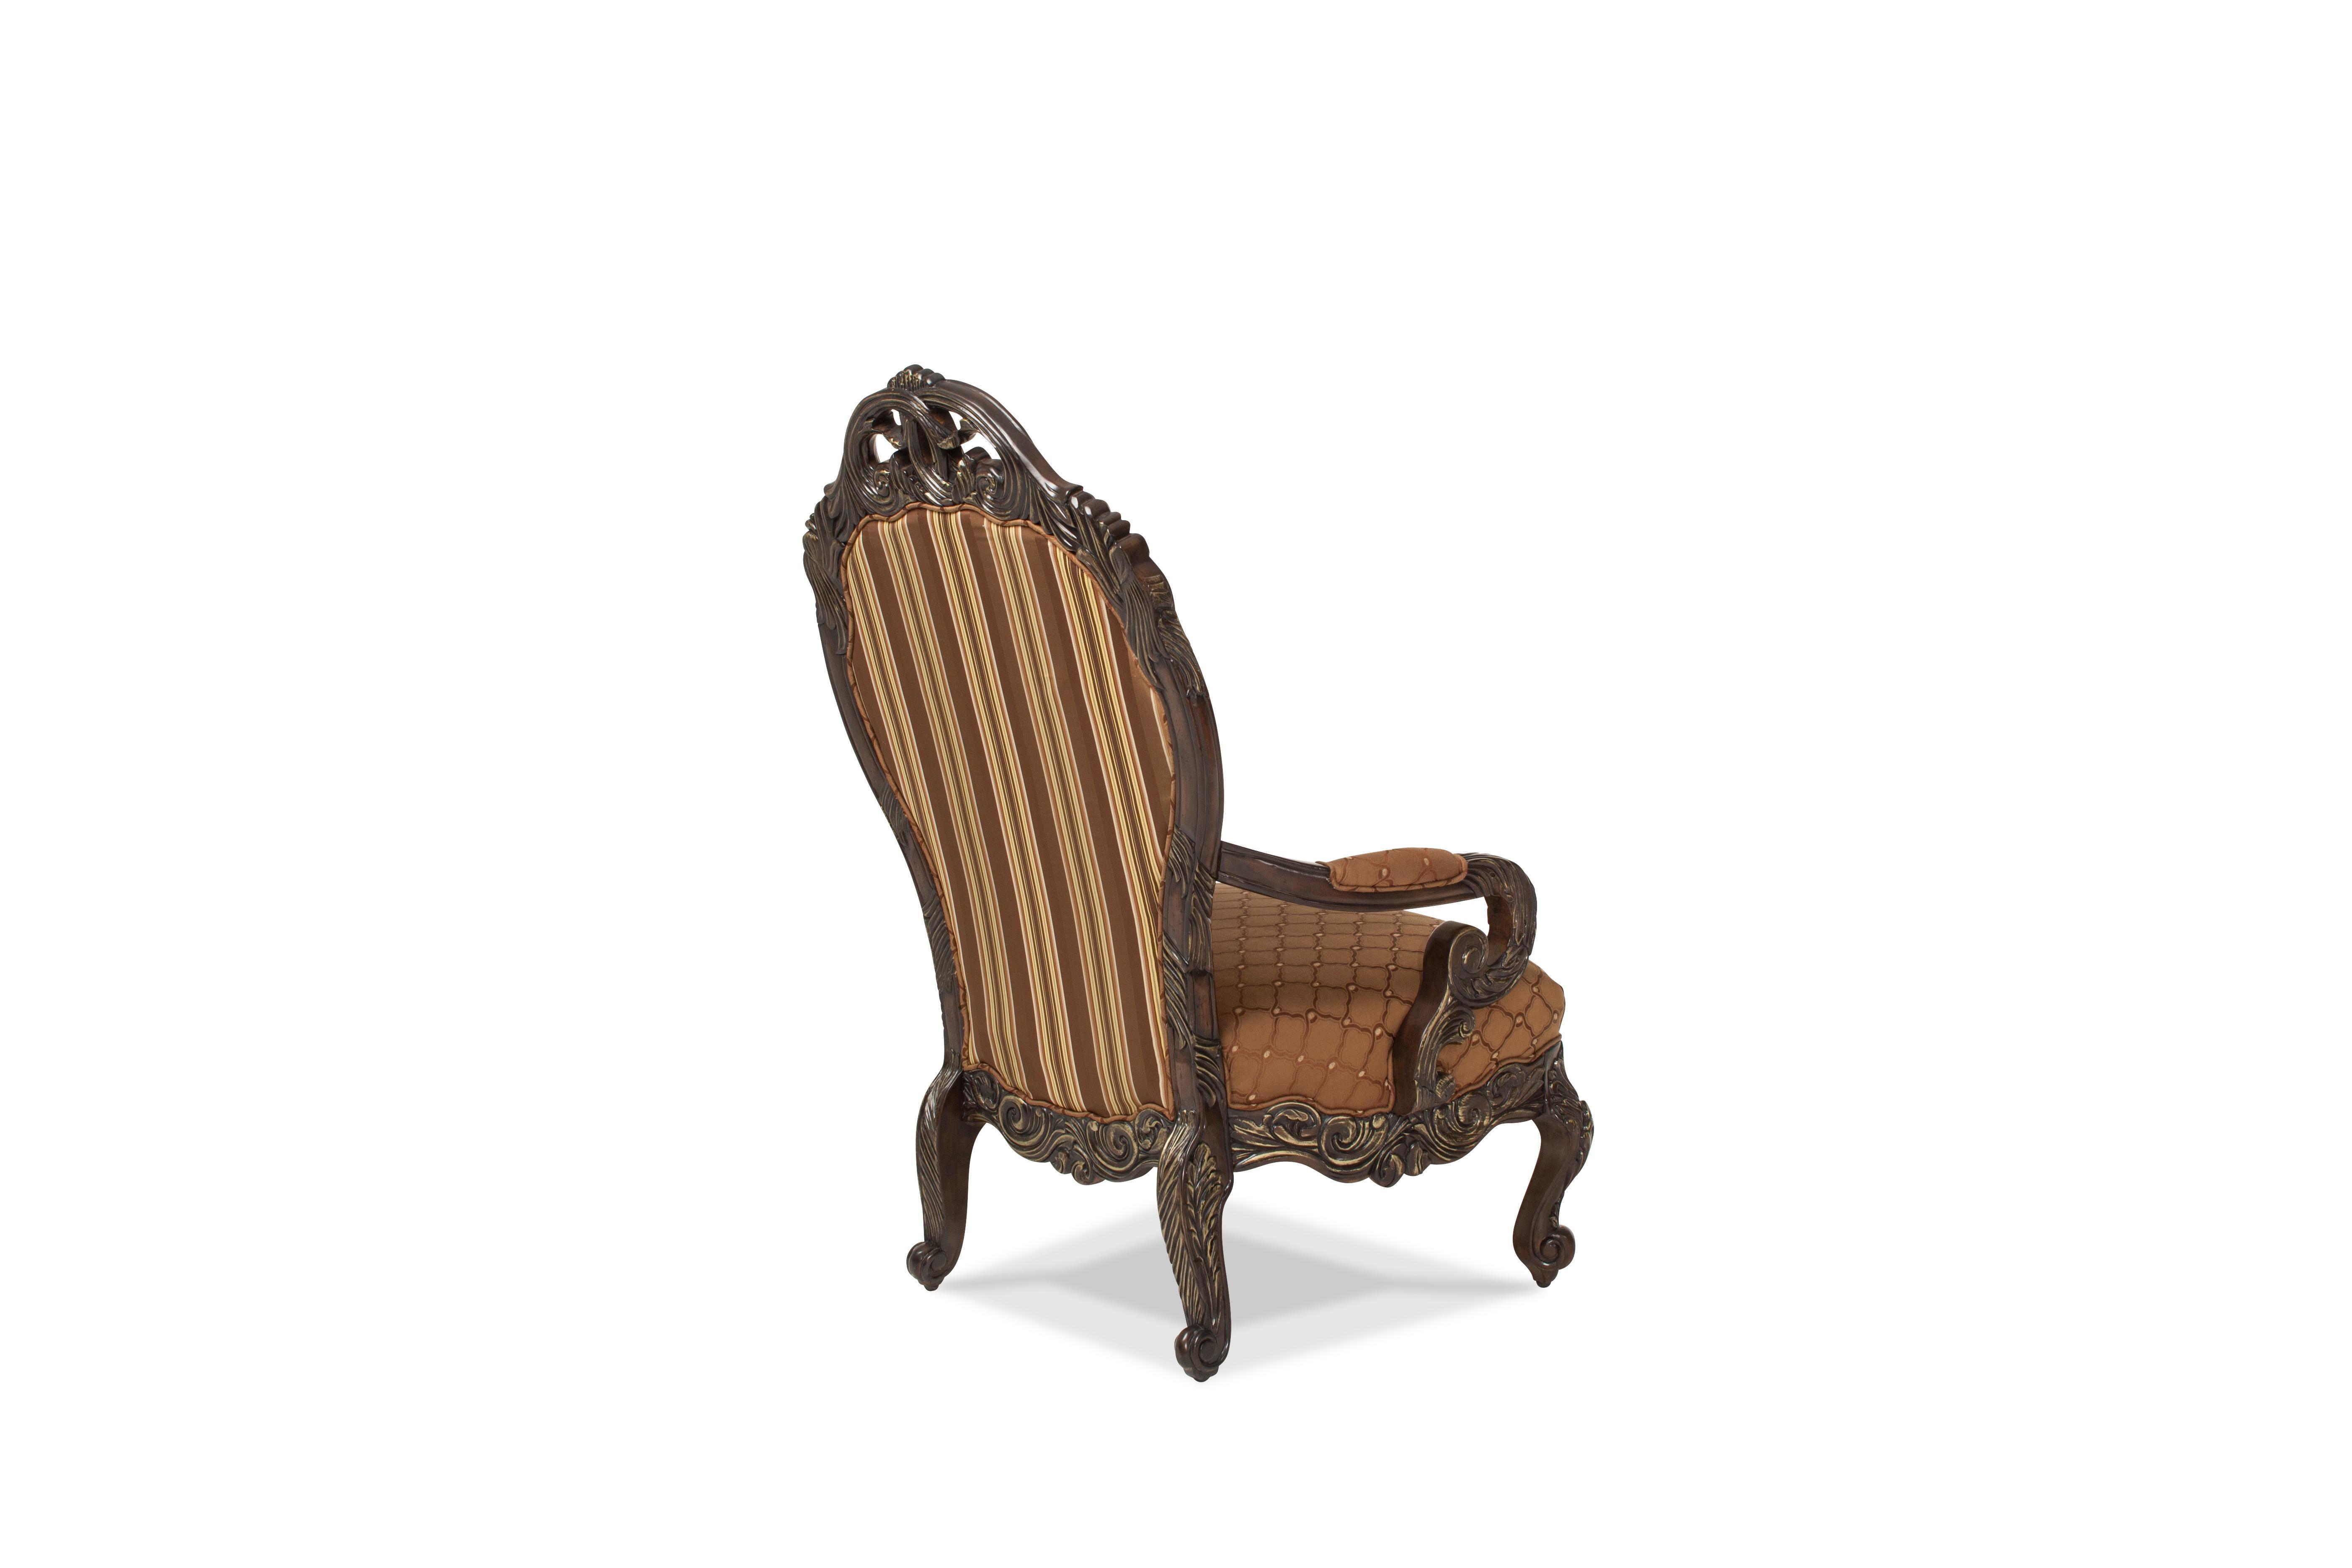 Superior Aico Furniture Essex Manor Op1 High Back Wood Trim Chair 76834 BRGRN 57